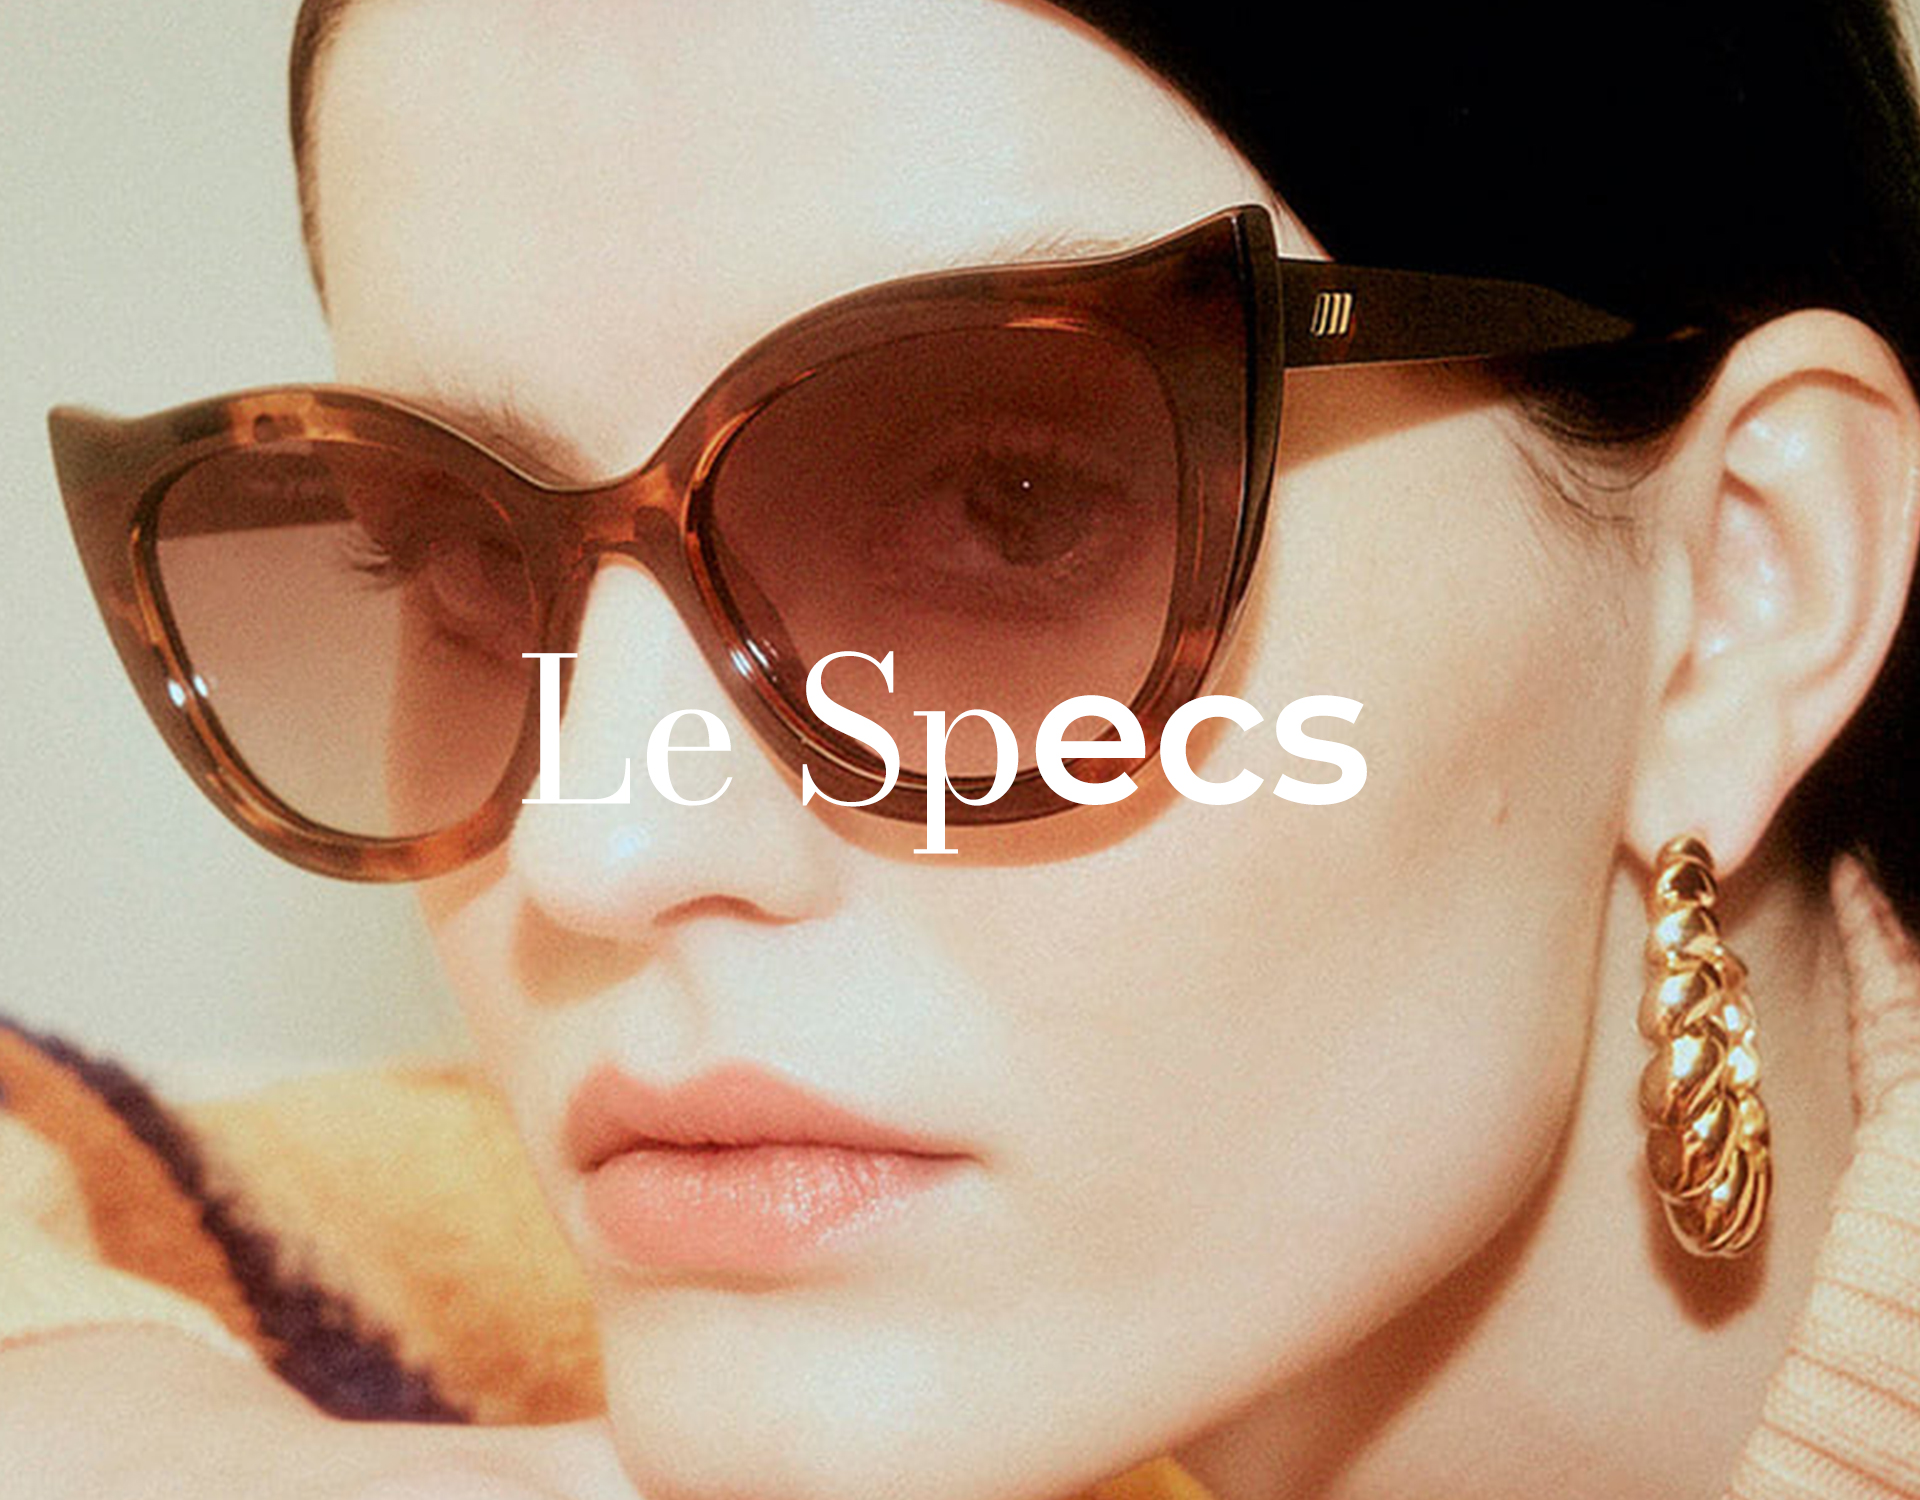 Frau trägt Cat-Eye Brille von Le Specs